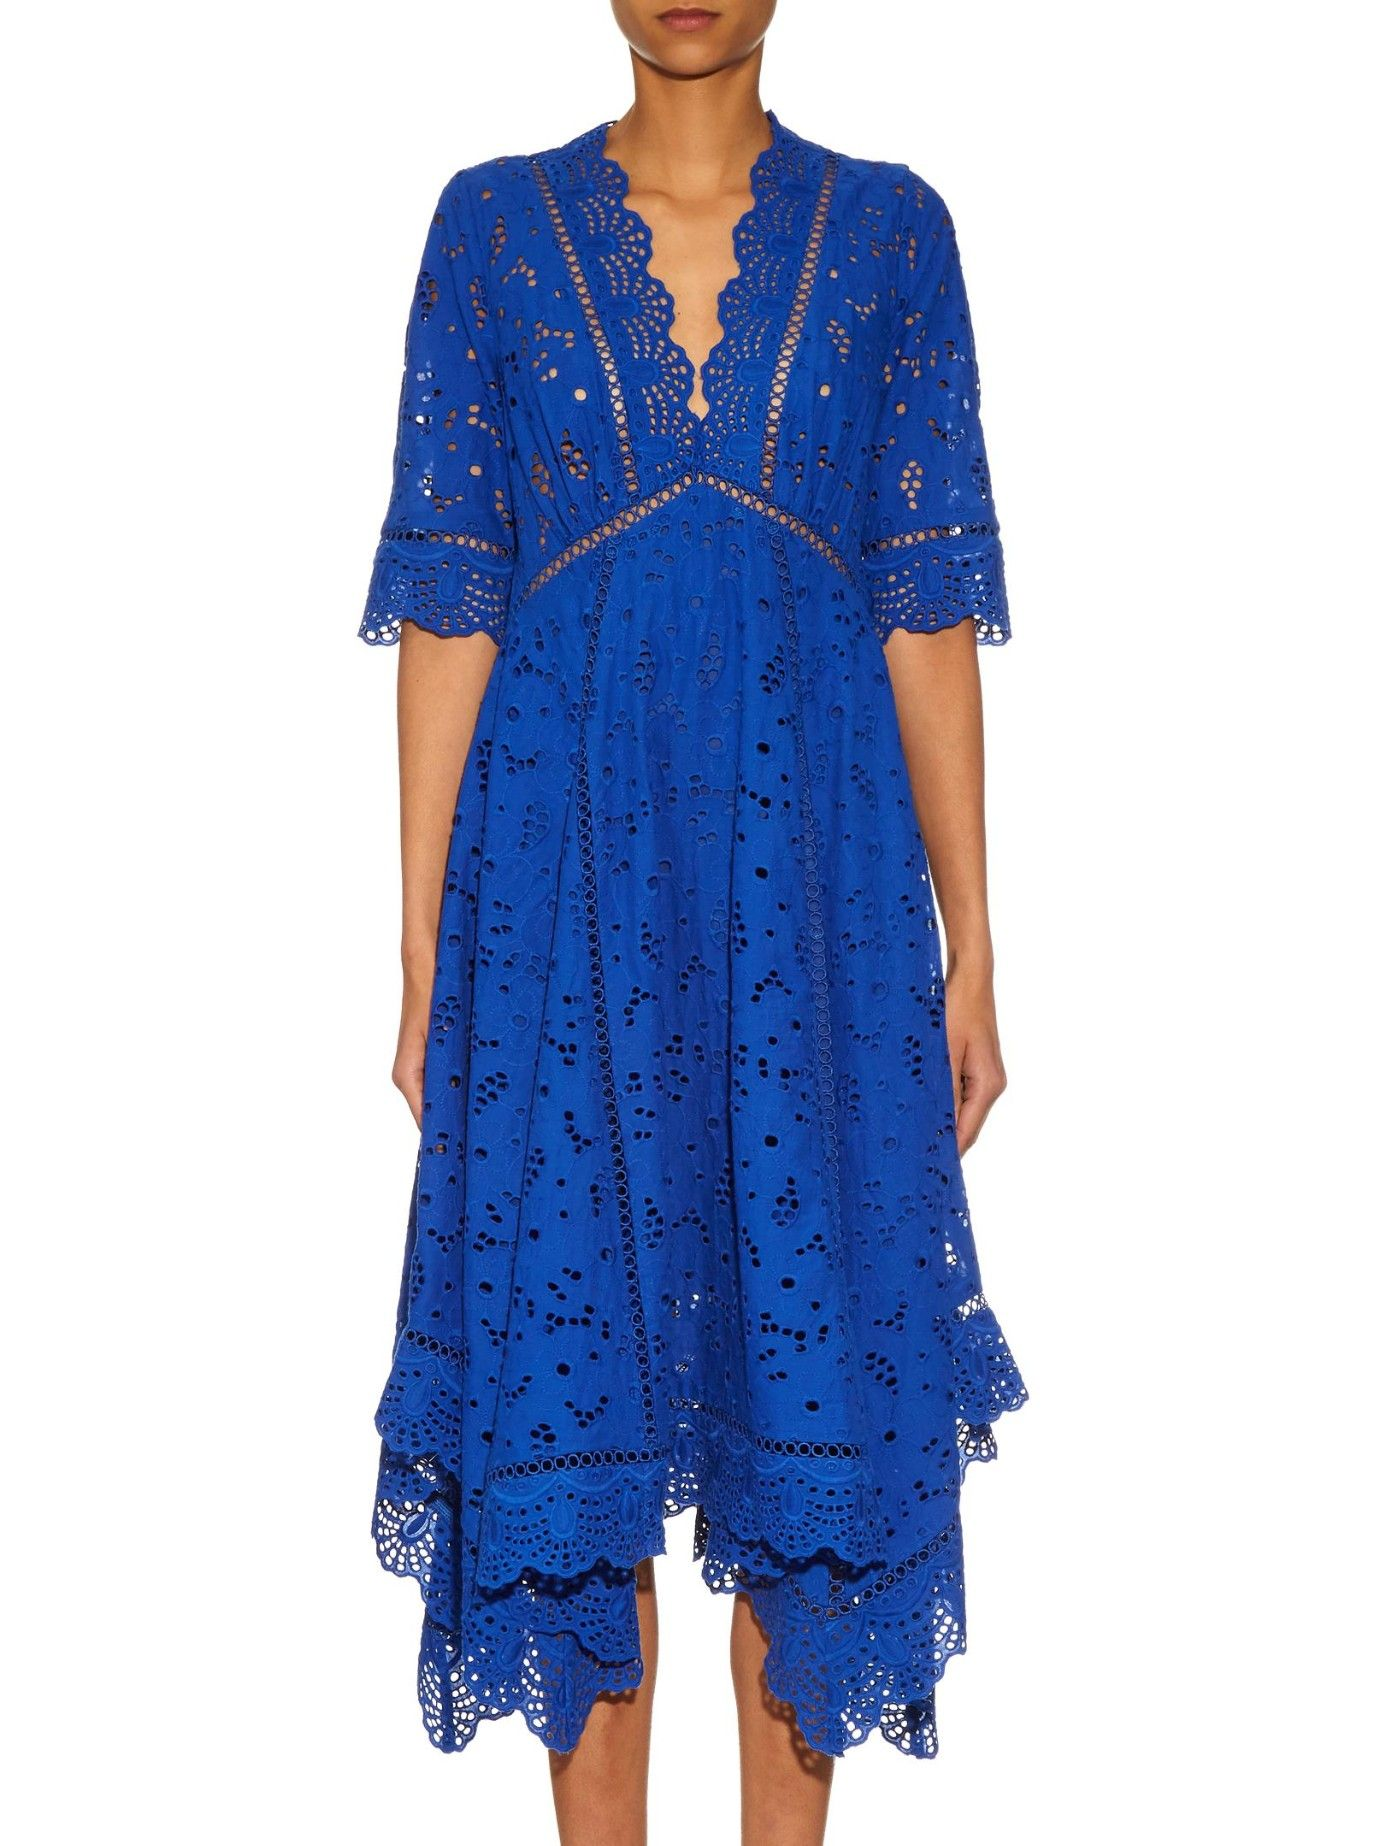 Hyper Eyelet Broderie Anglaise Dress Zimmermann Matchesfashion Us In 2020 Dress Neck Designs Blue Cotton Dress Dresses